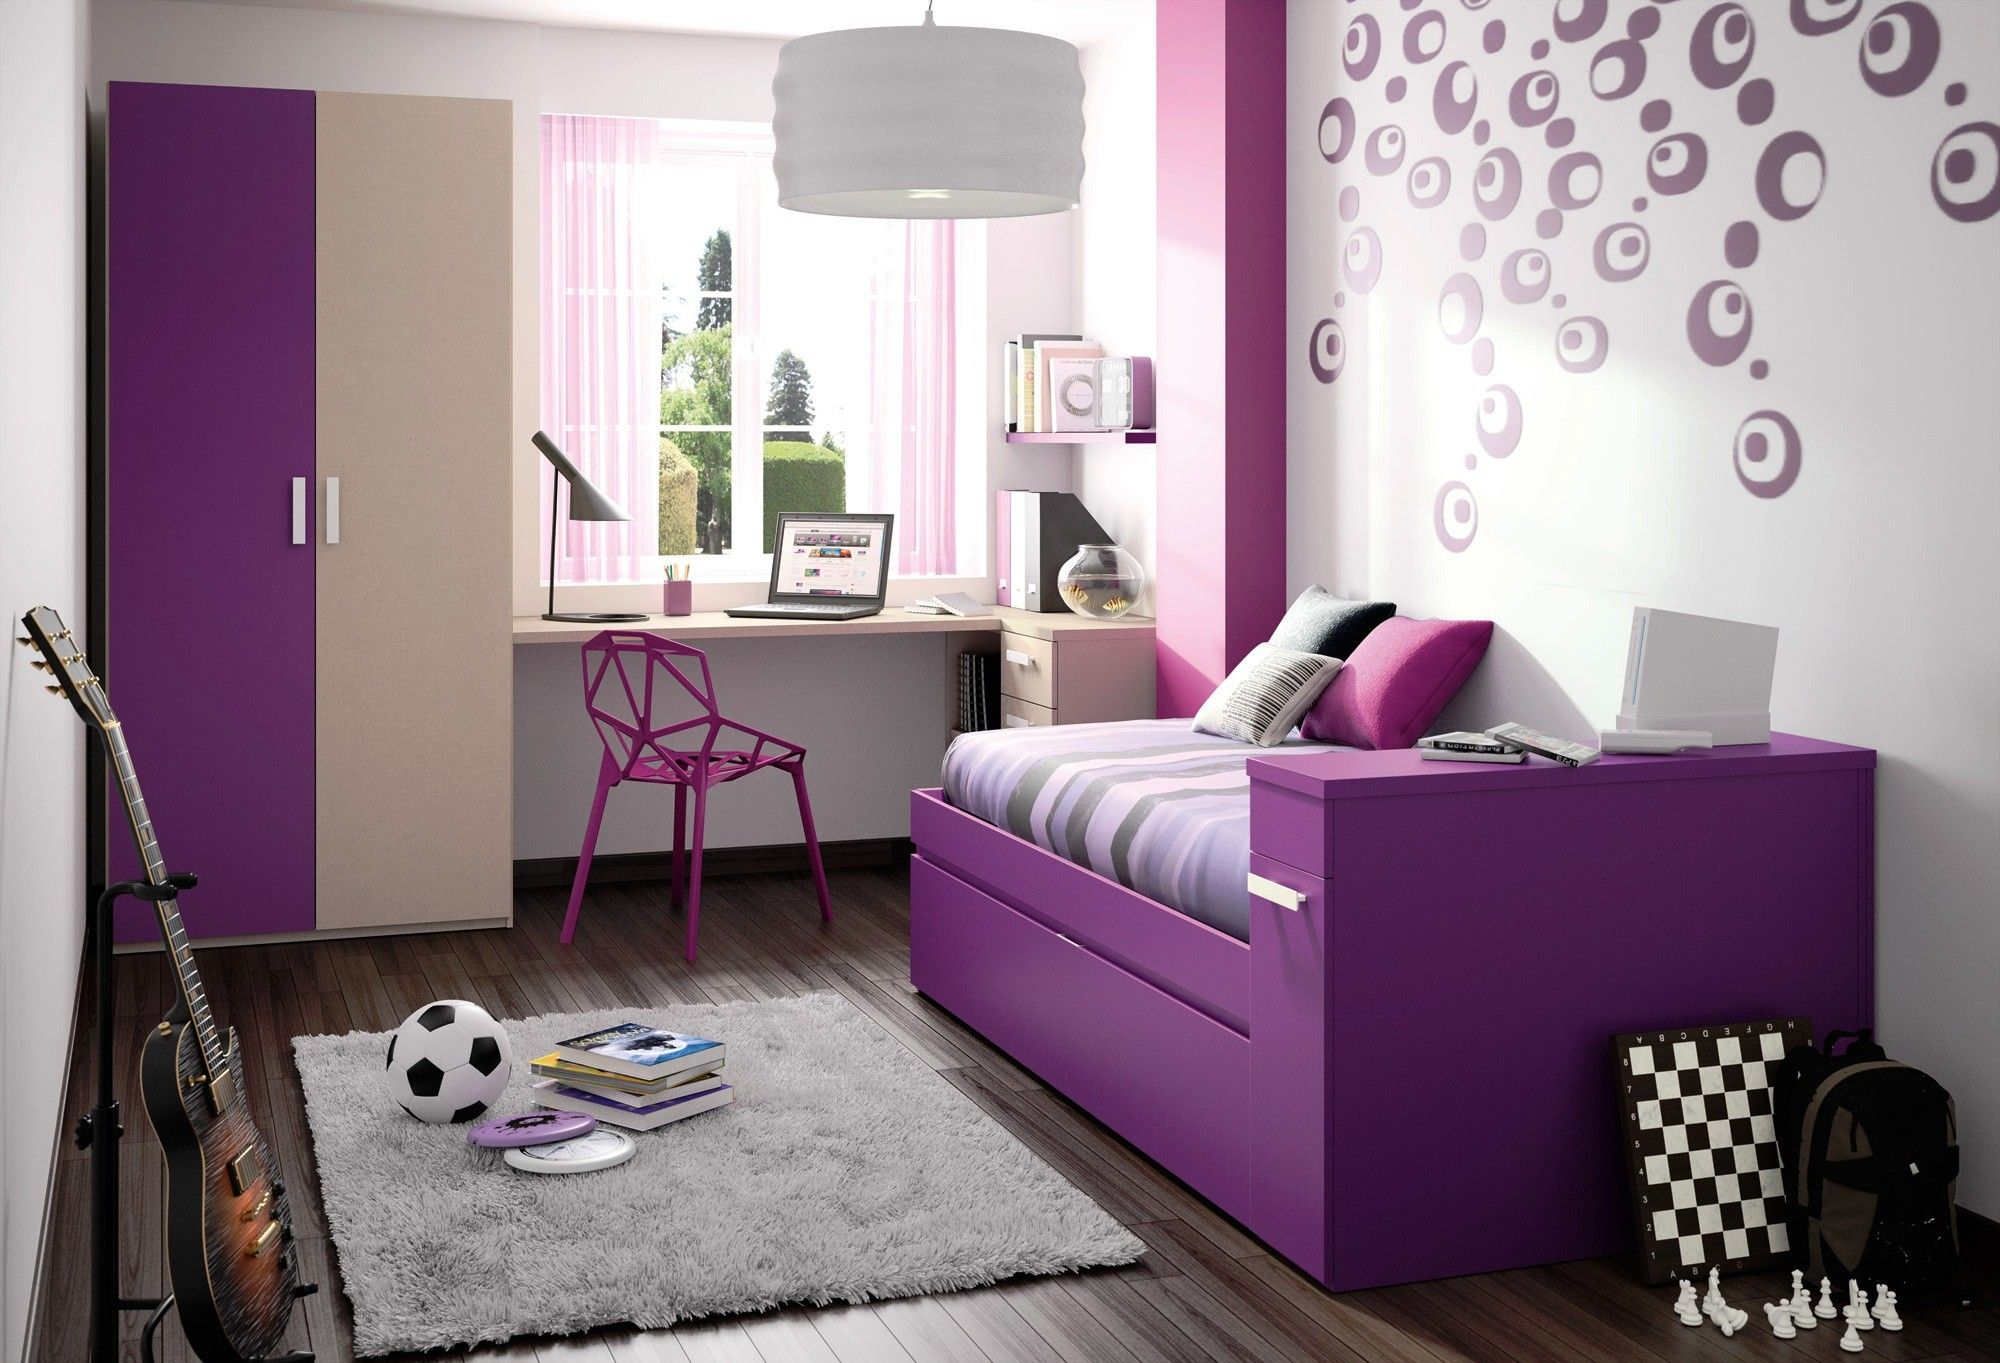 Interior bedroom design teenage girls  dream interior design teenage girl bedroom ideas  white fur rug